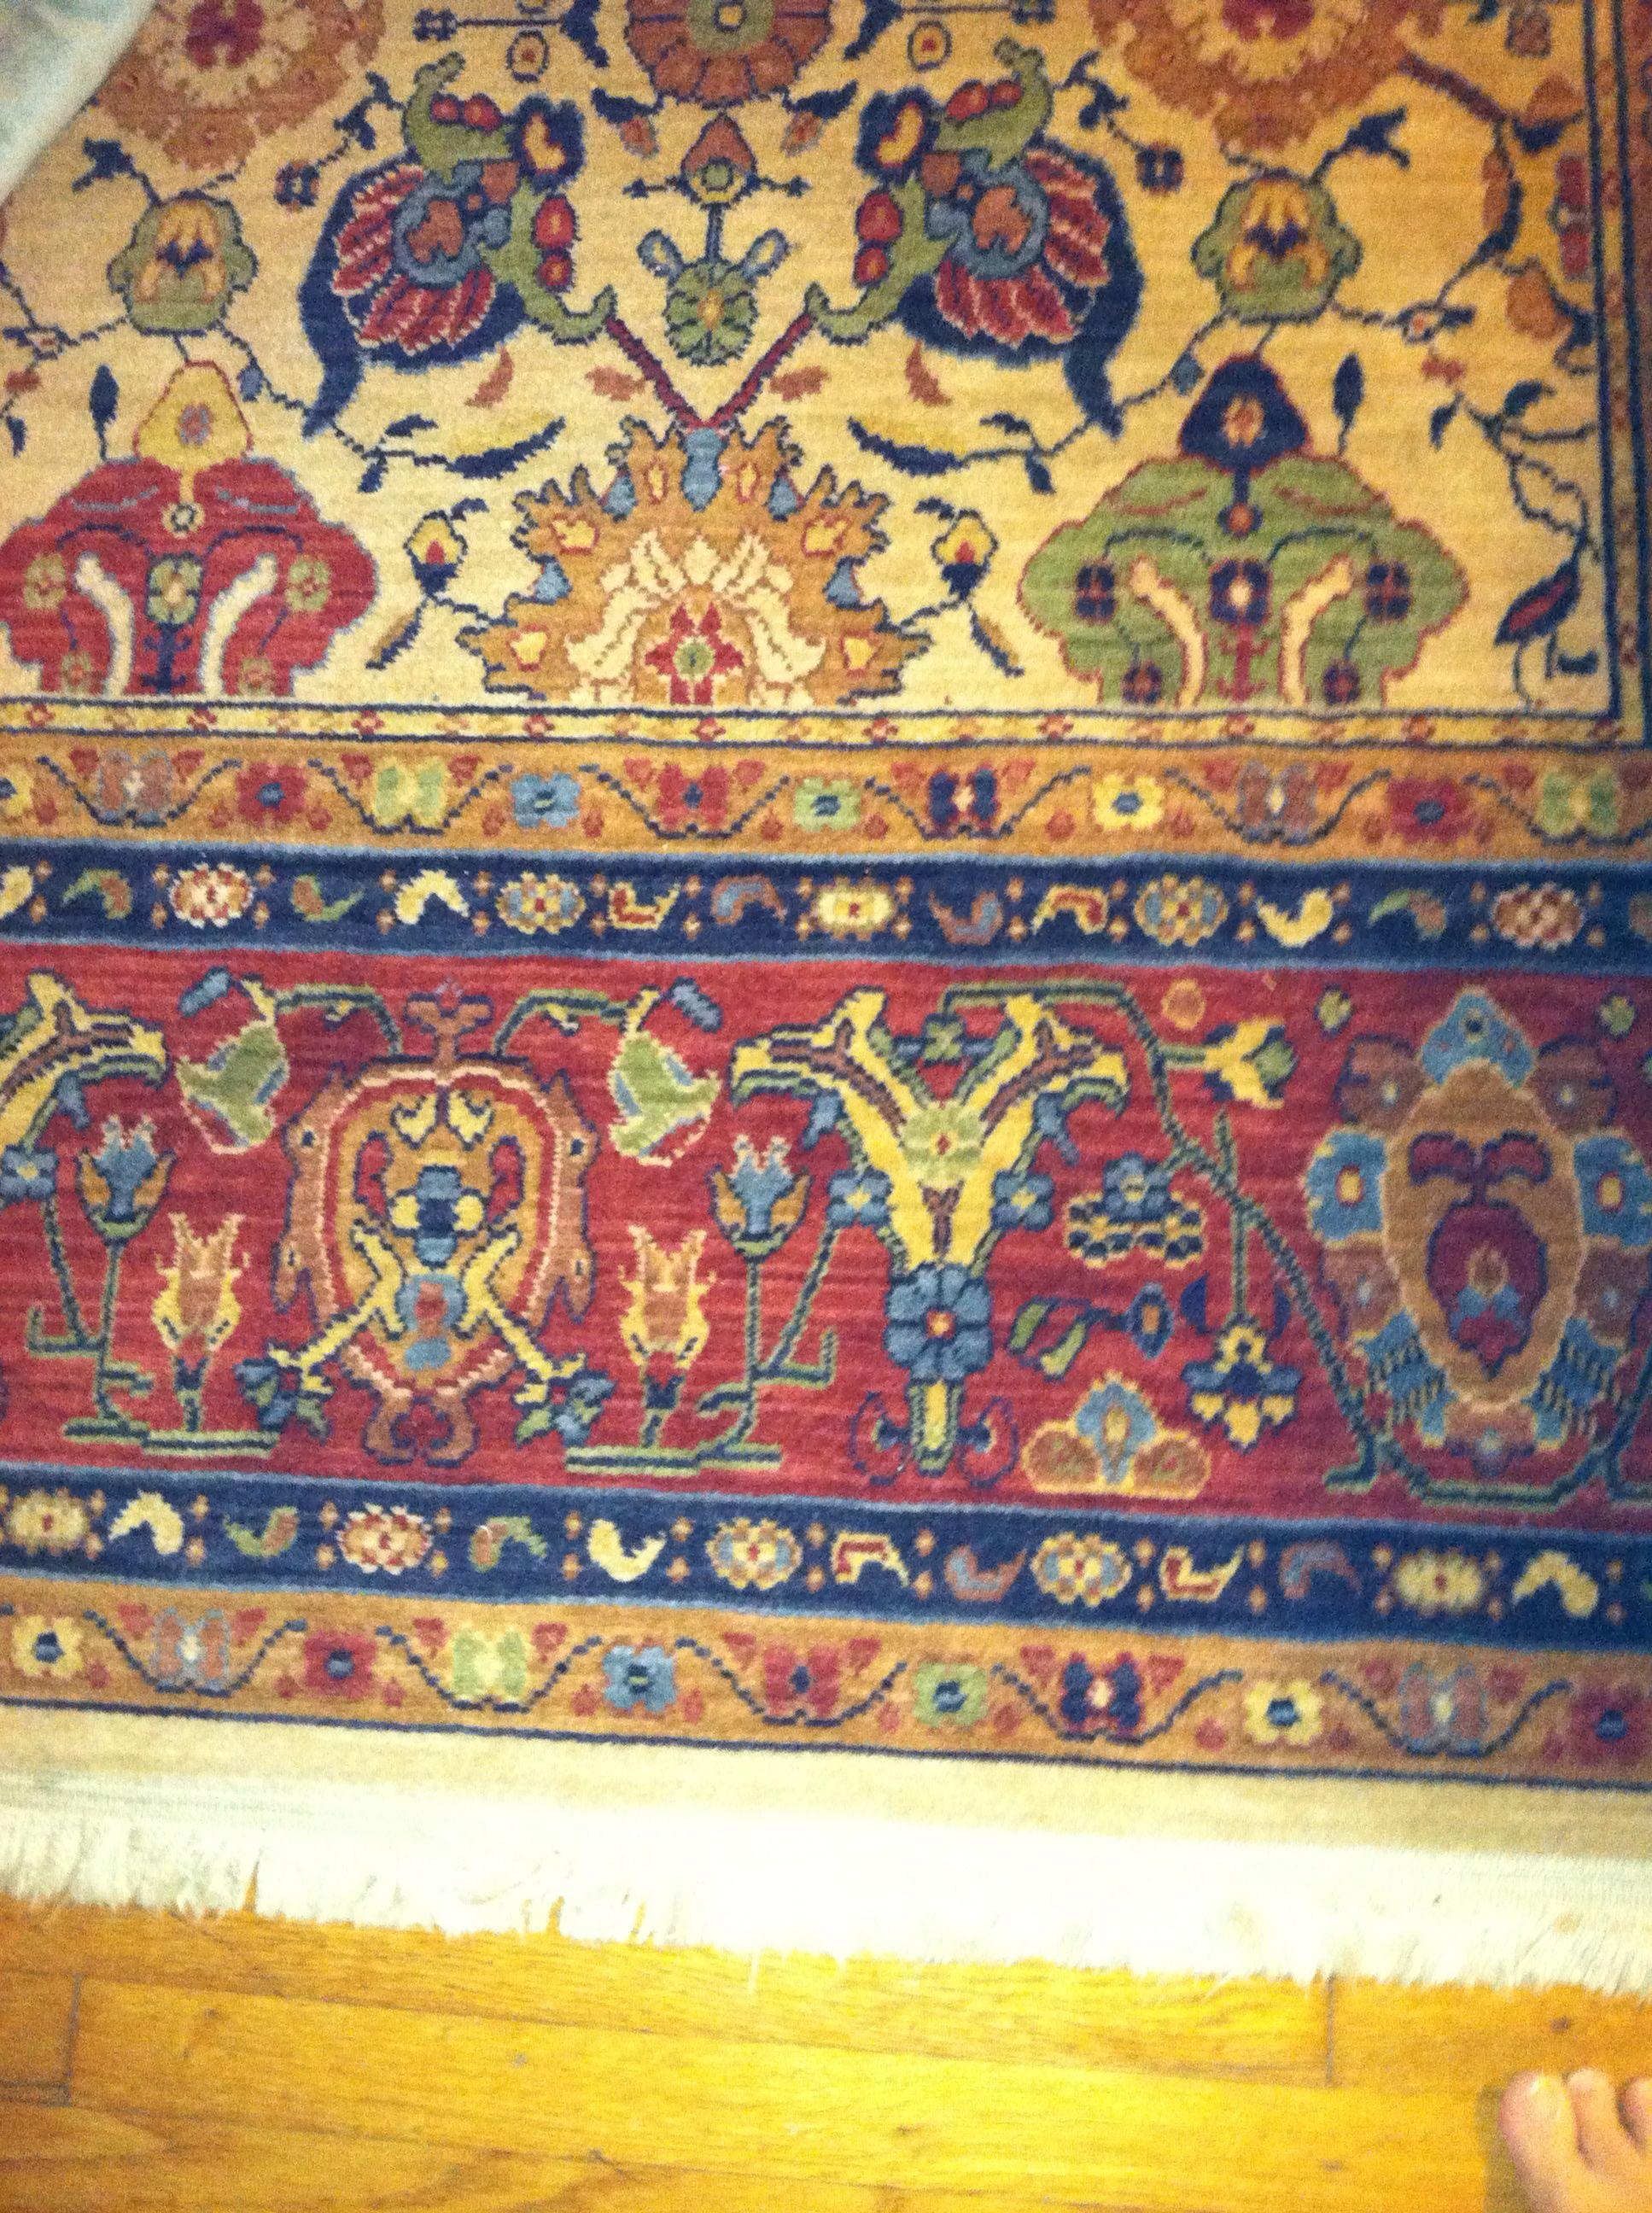 Karastan Rug Roximately 9 X 12